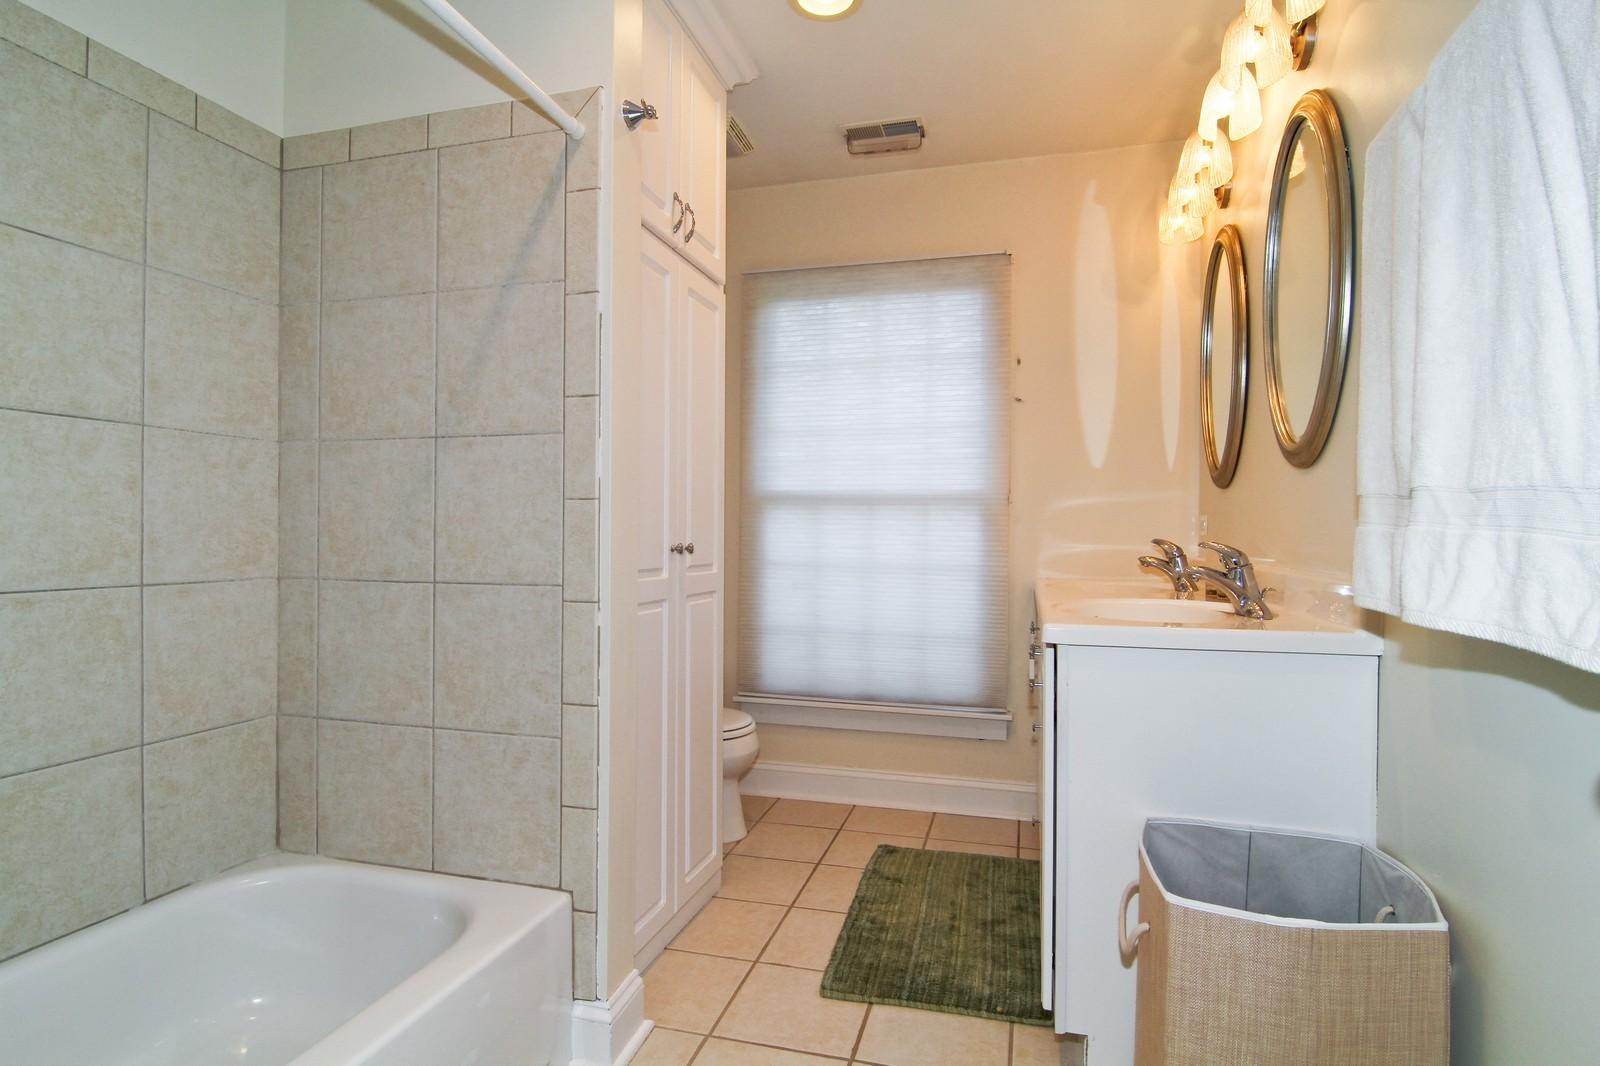 Real Estate Photography - 441 Edgewood Dr, La Grange, IL, 60525 - 3rd Bathroom